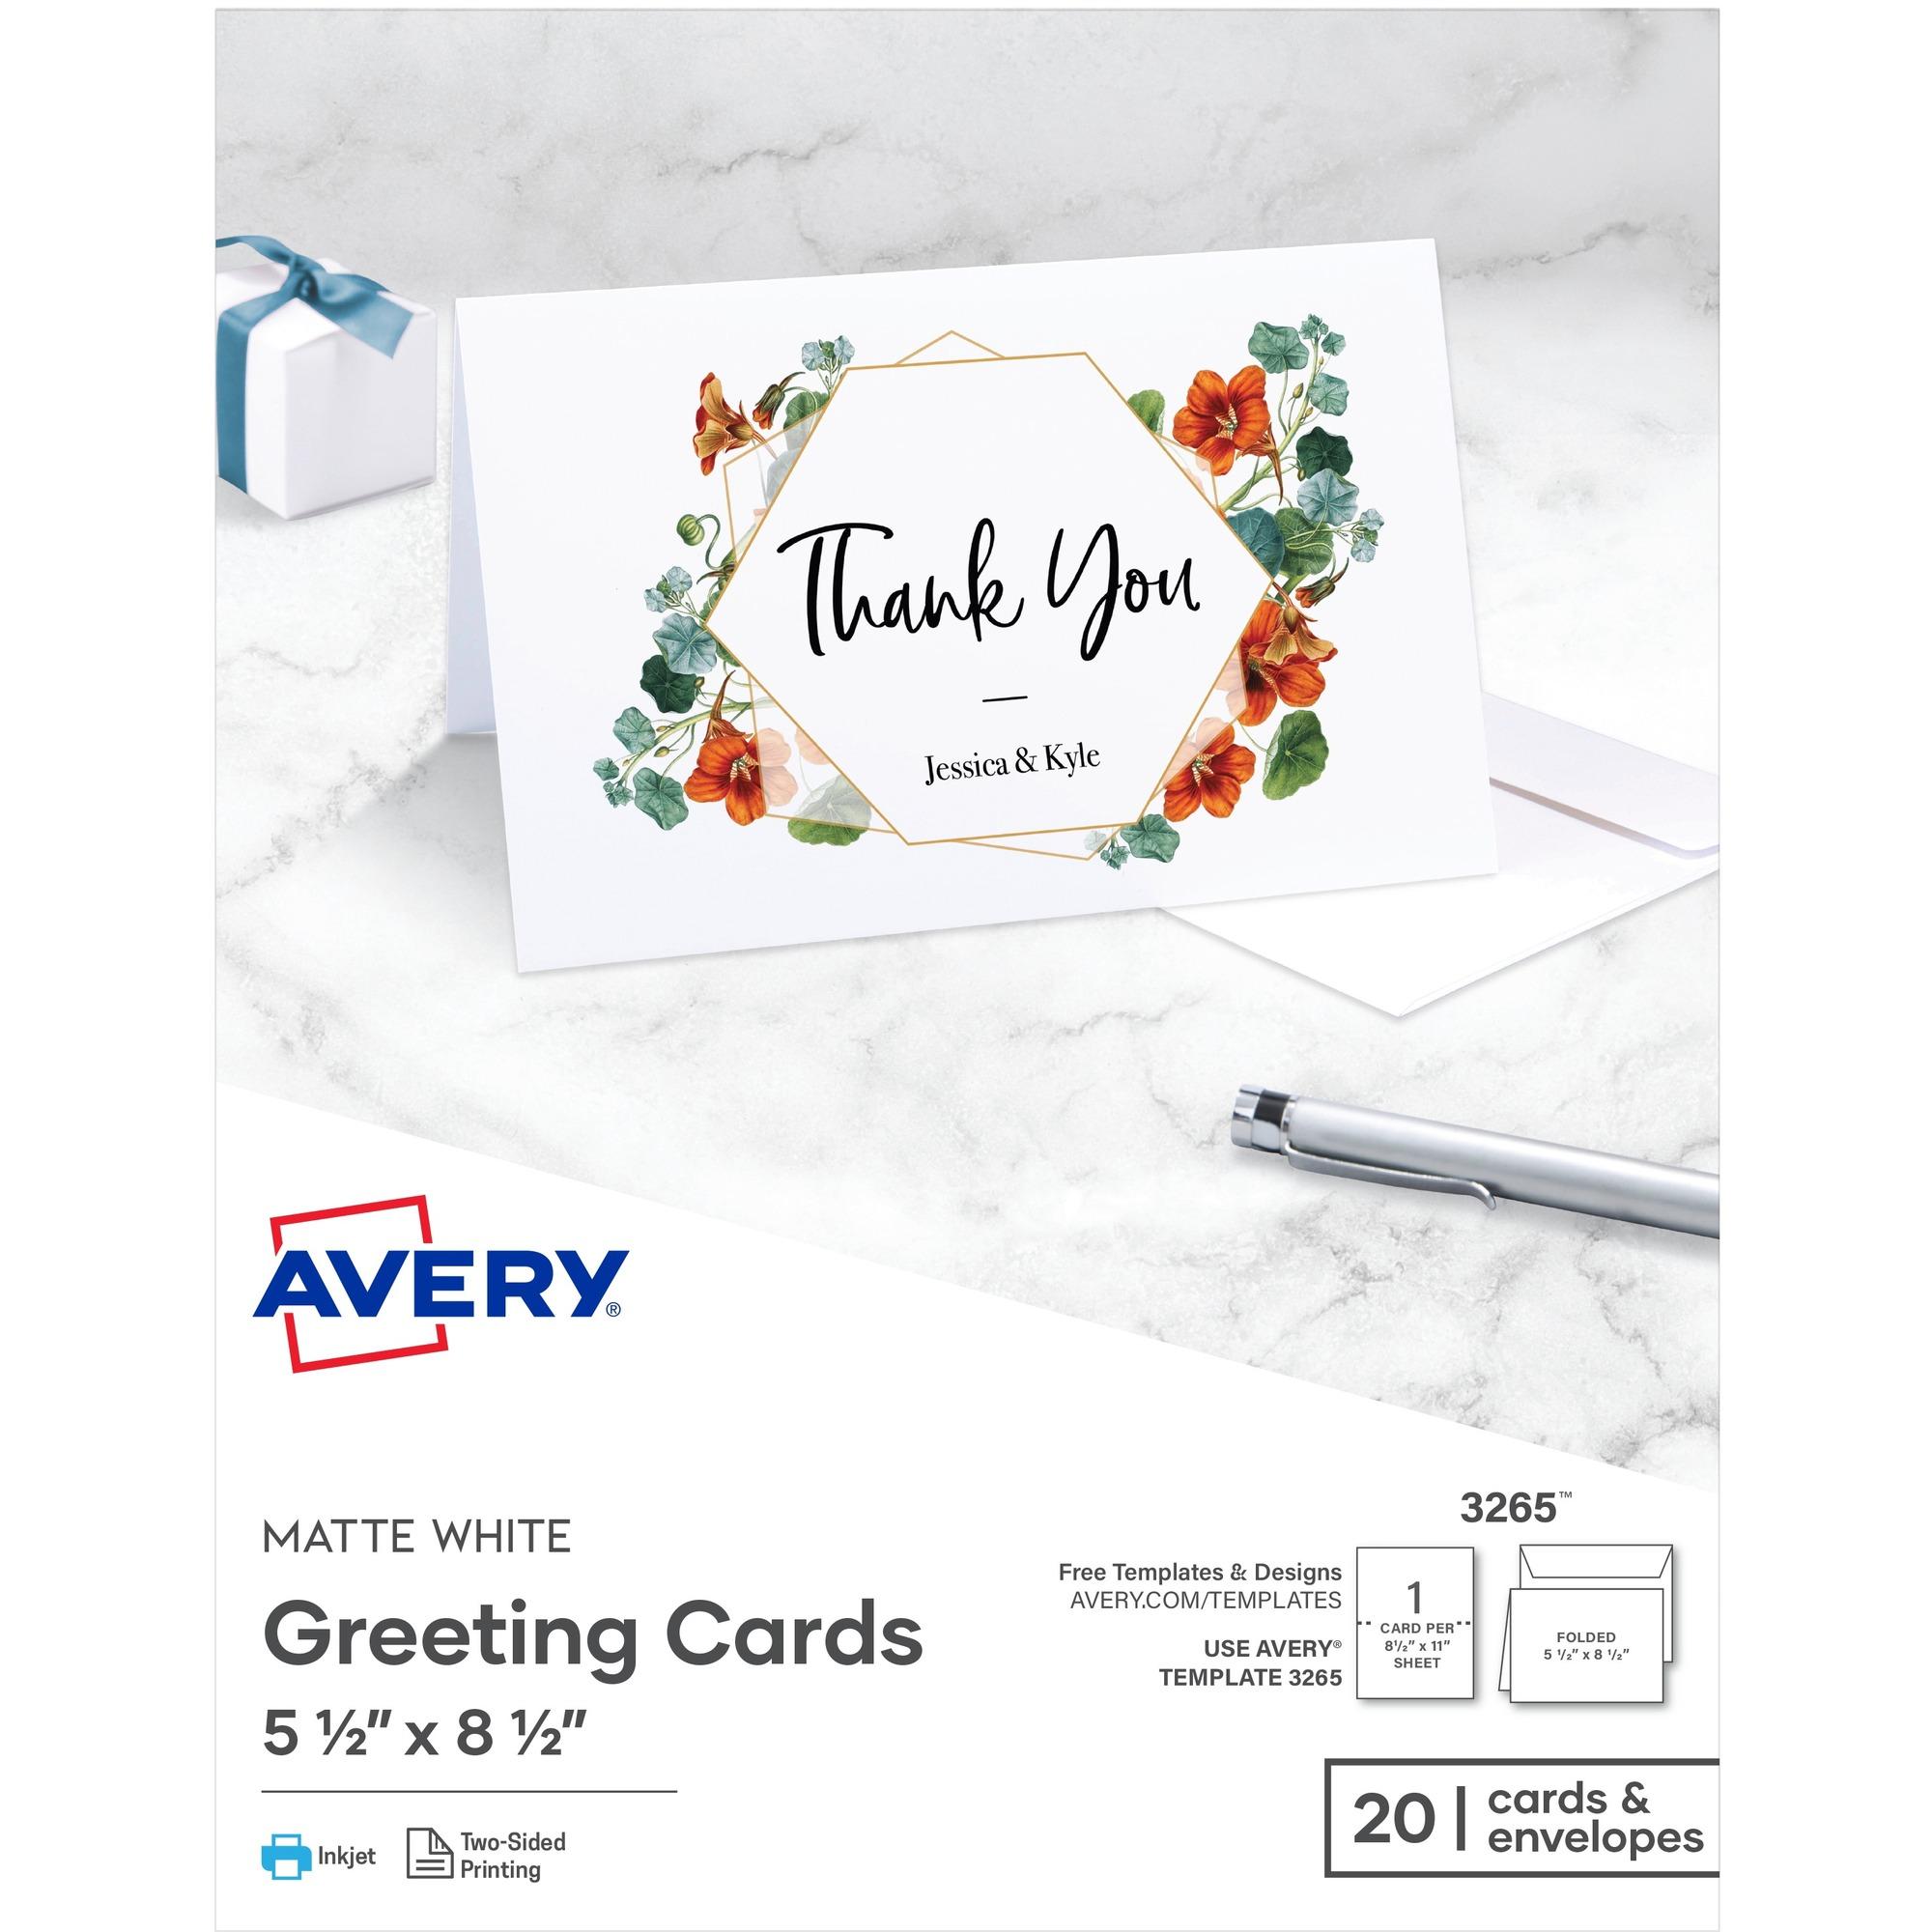 Averyreg Greeting Card